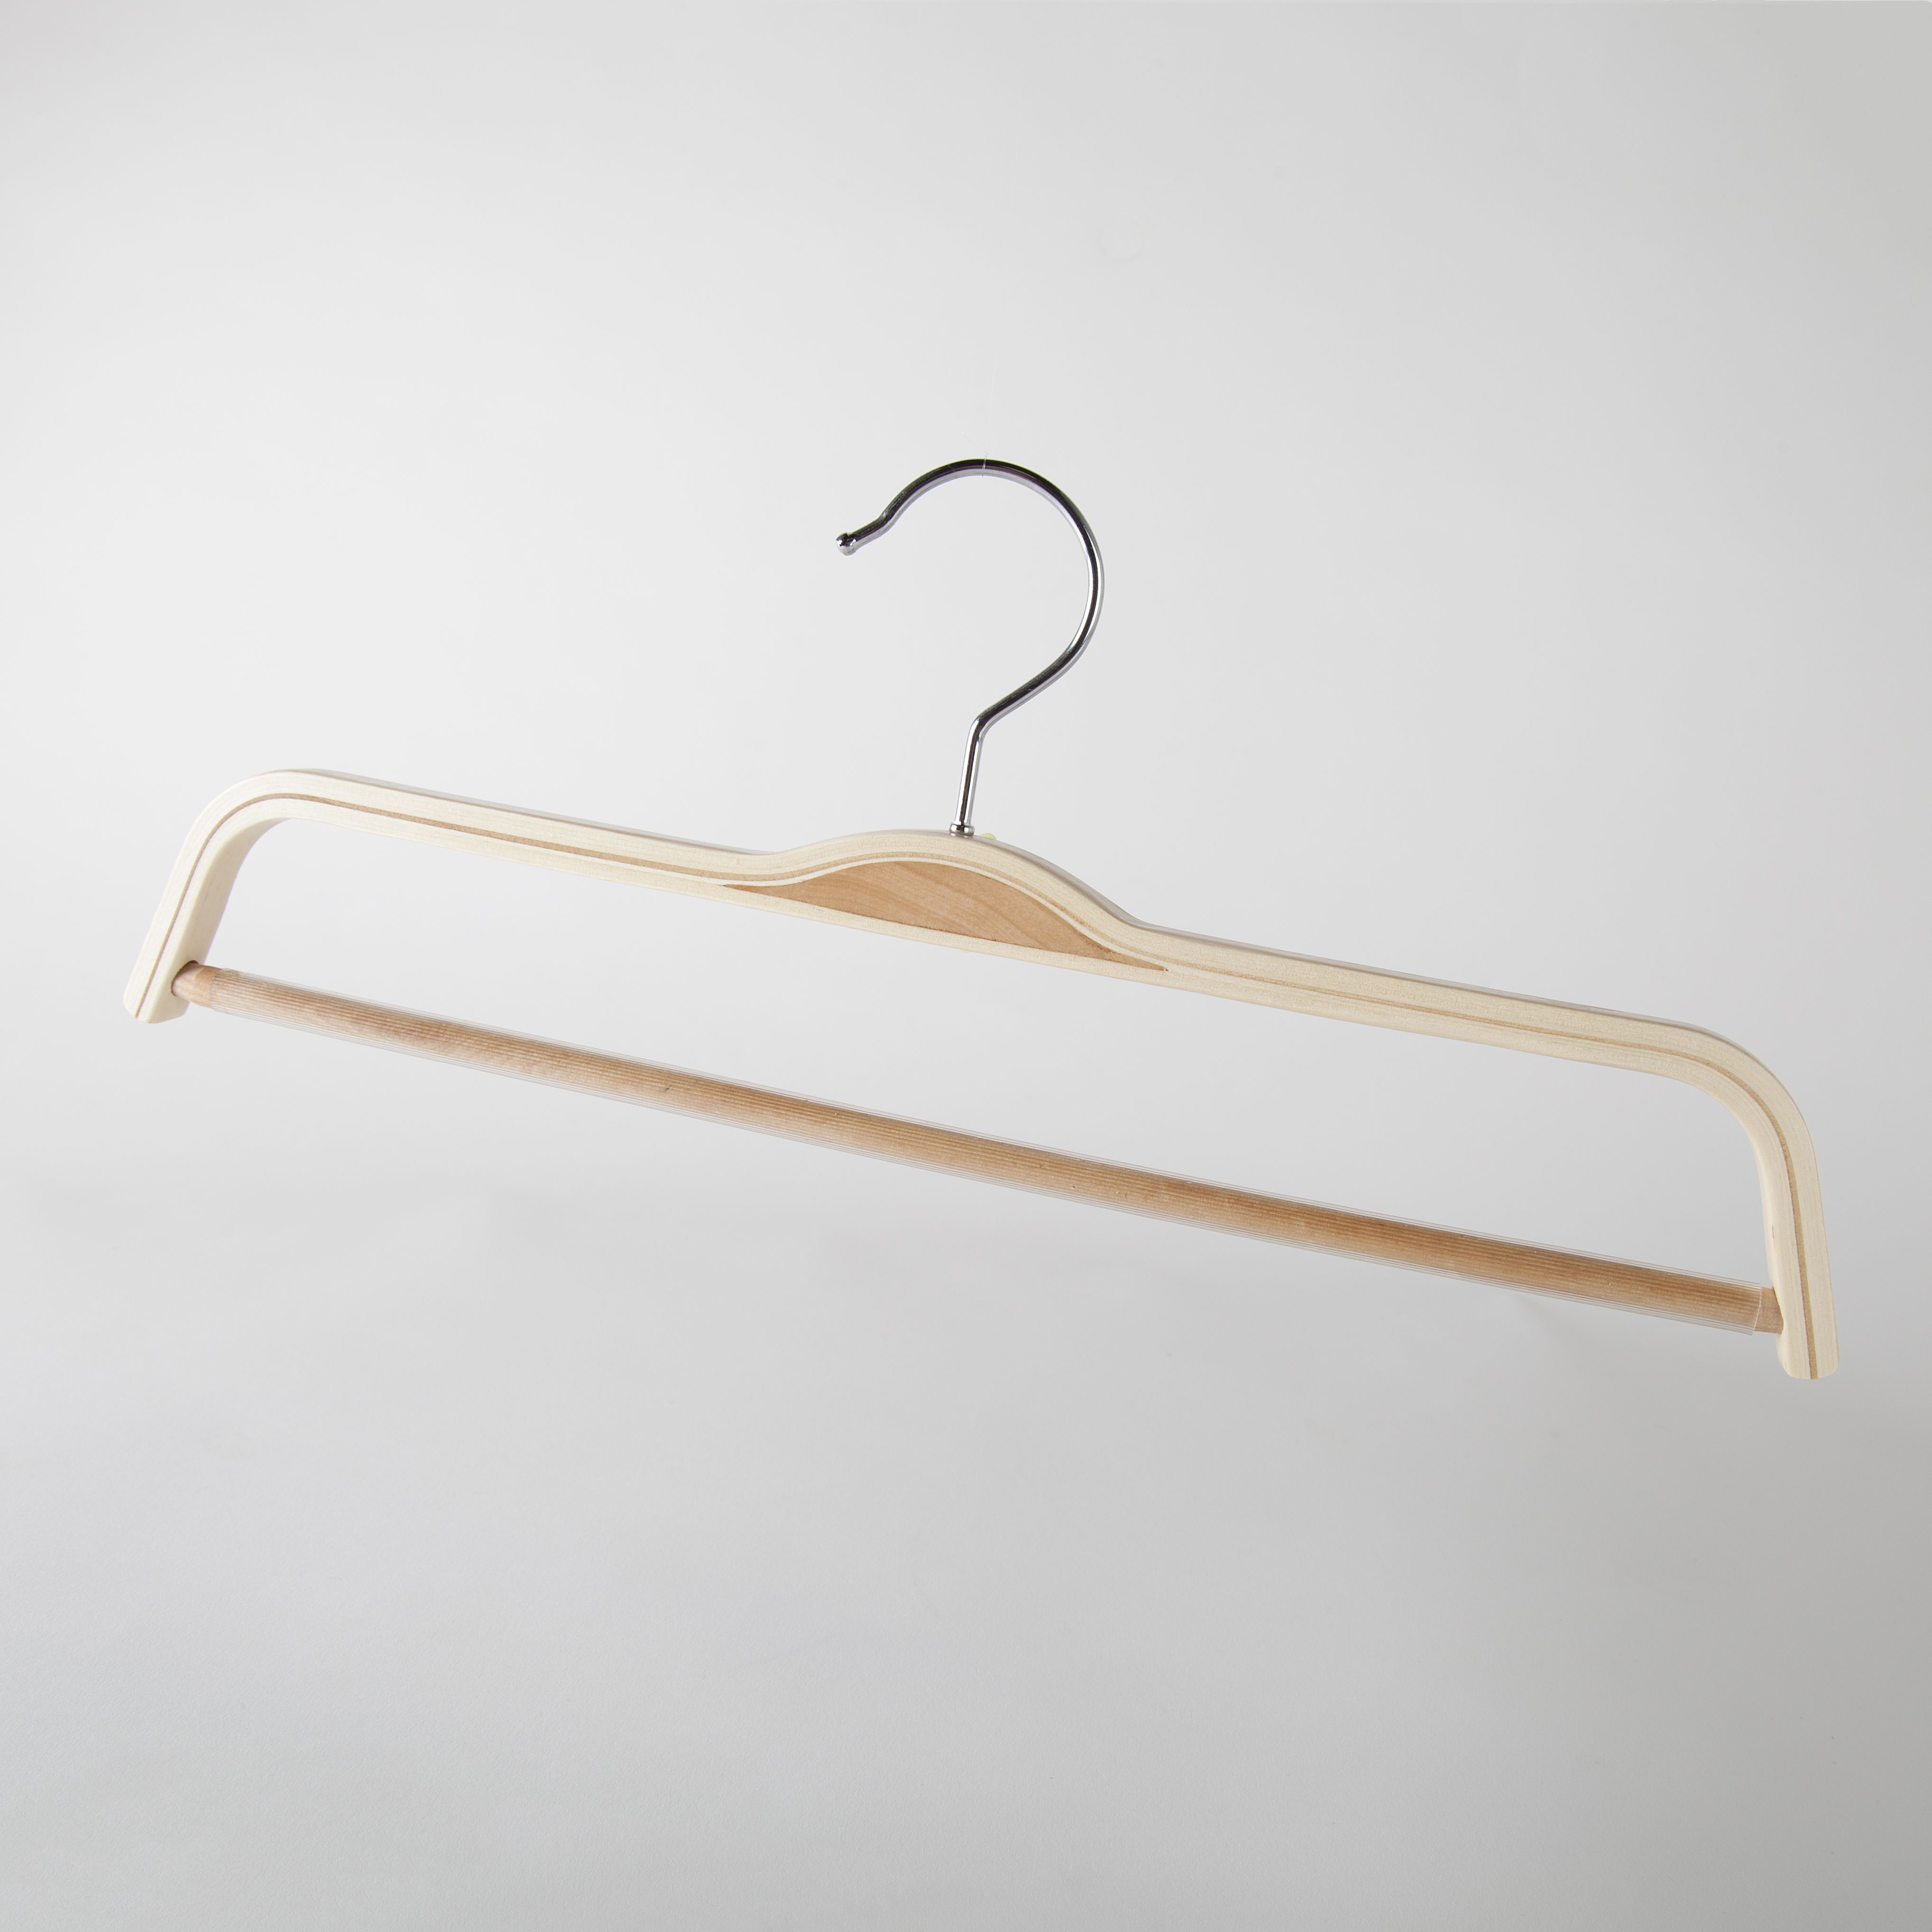 Wood Clothing Hangers Suit Coat Pant Hangers In Cedar Maple Oak